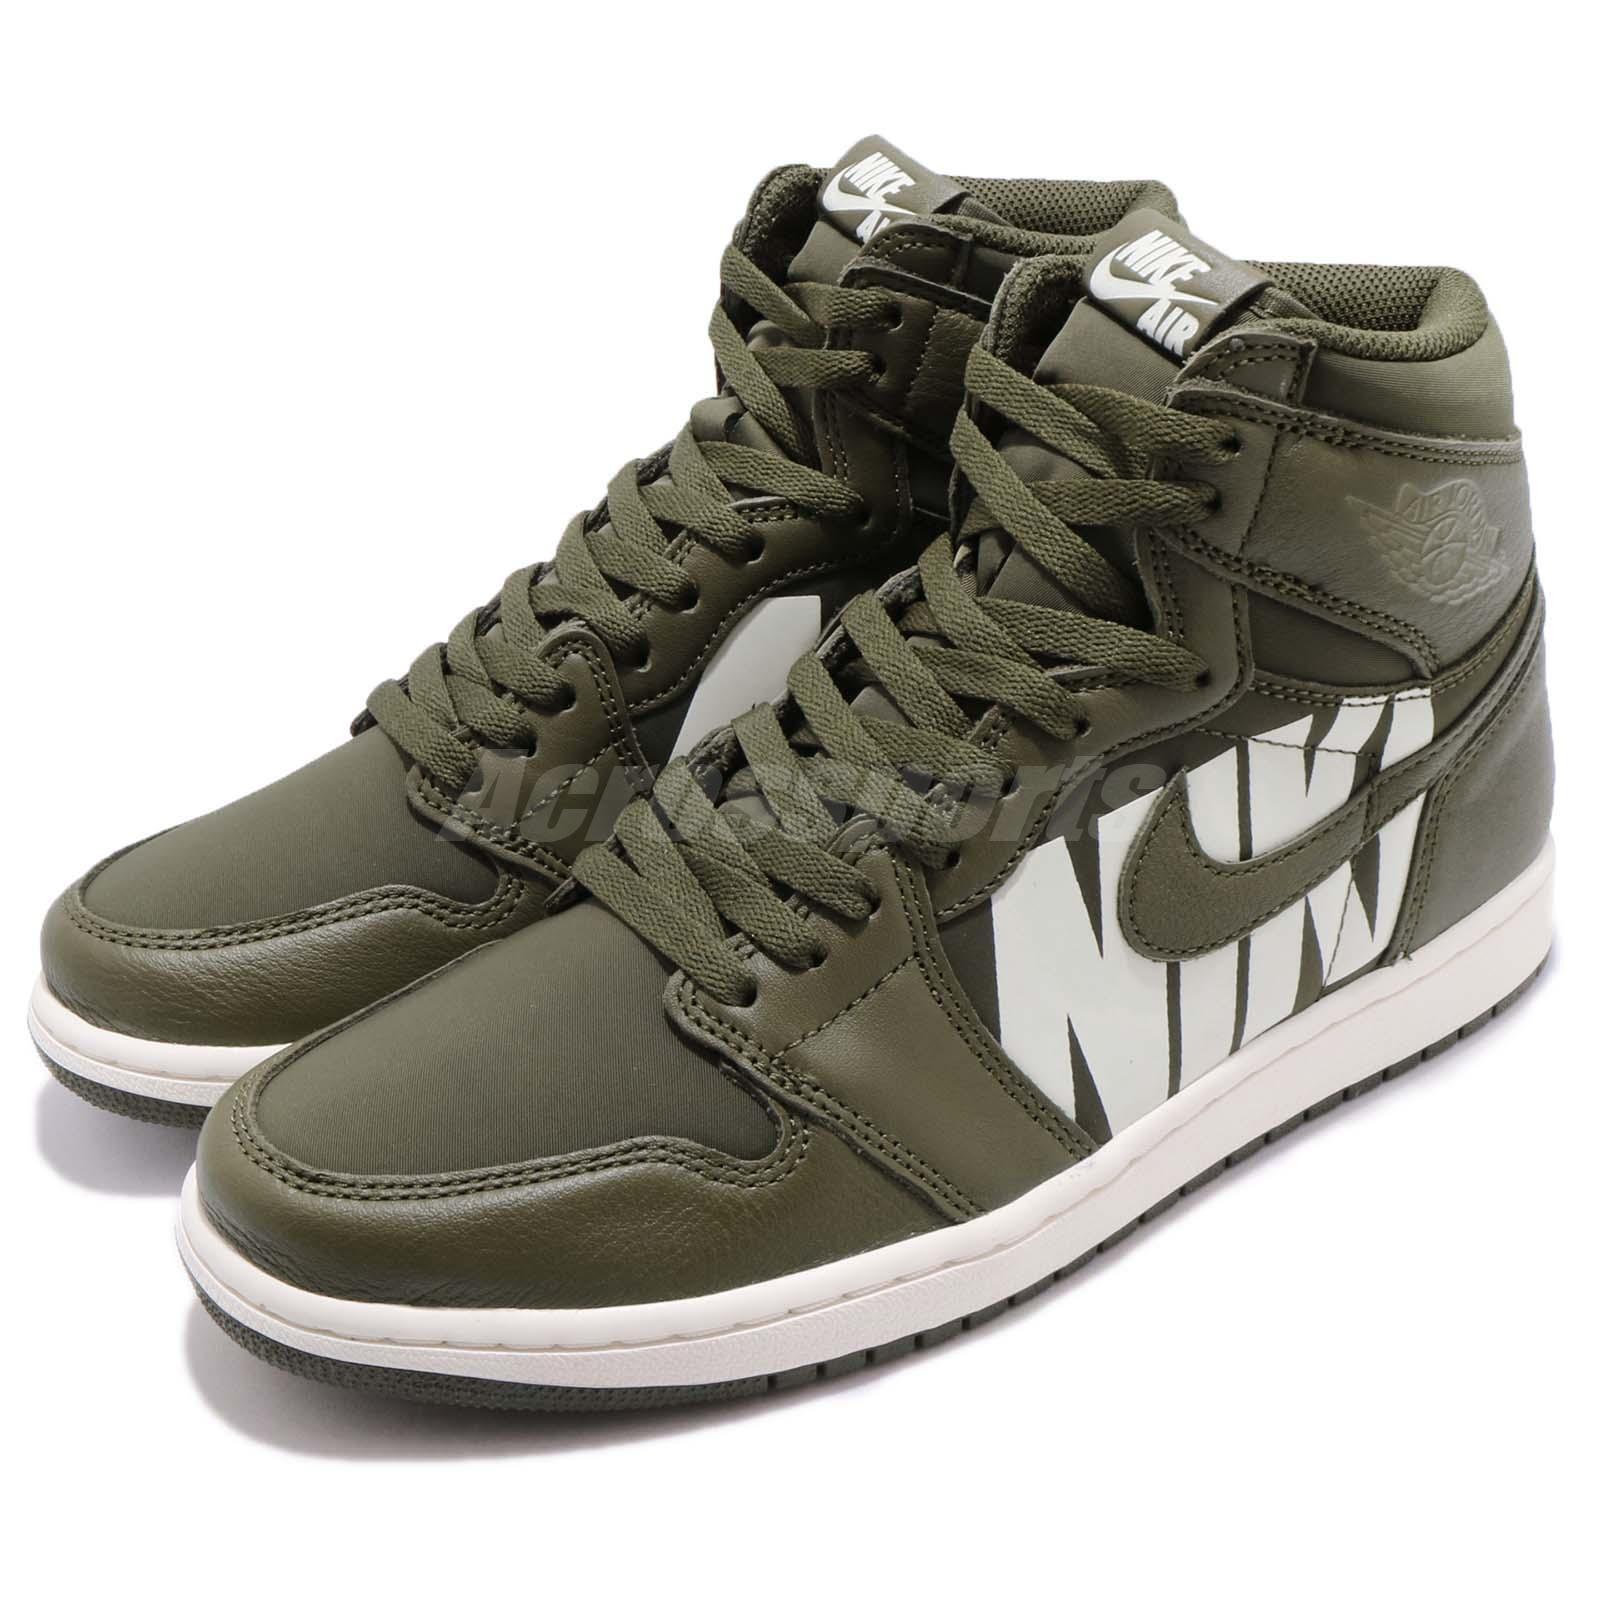 Nike Air Jordan 1 Logos Retro High OG Big Logos 1 Olive Canvas Sail AJ1 Hombre 555088300 011907